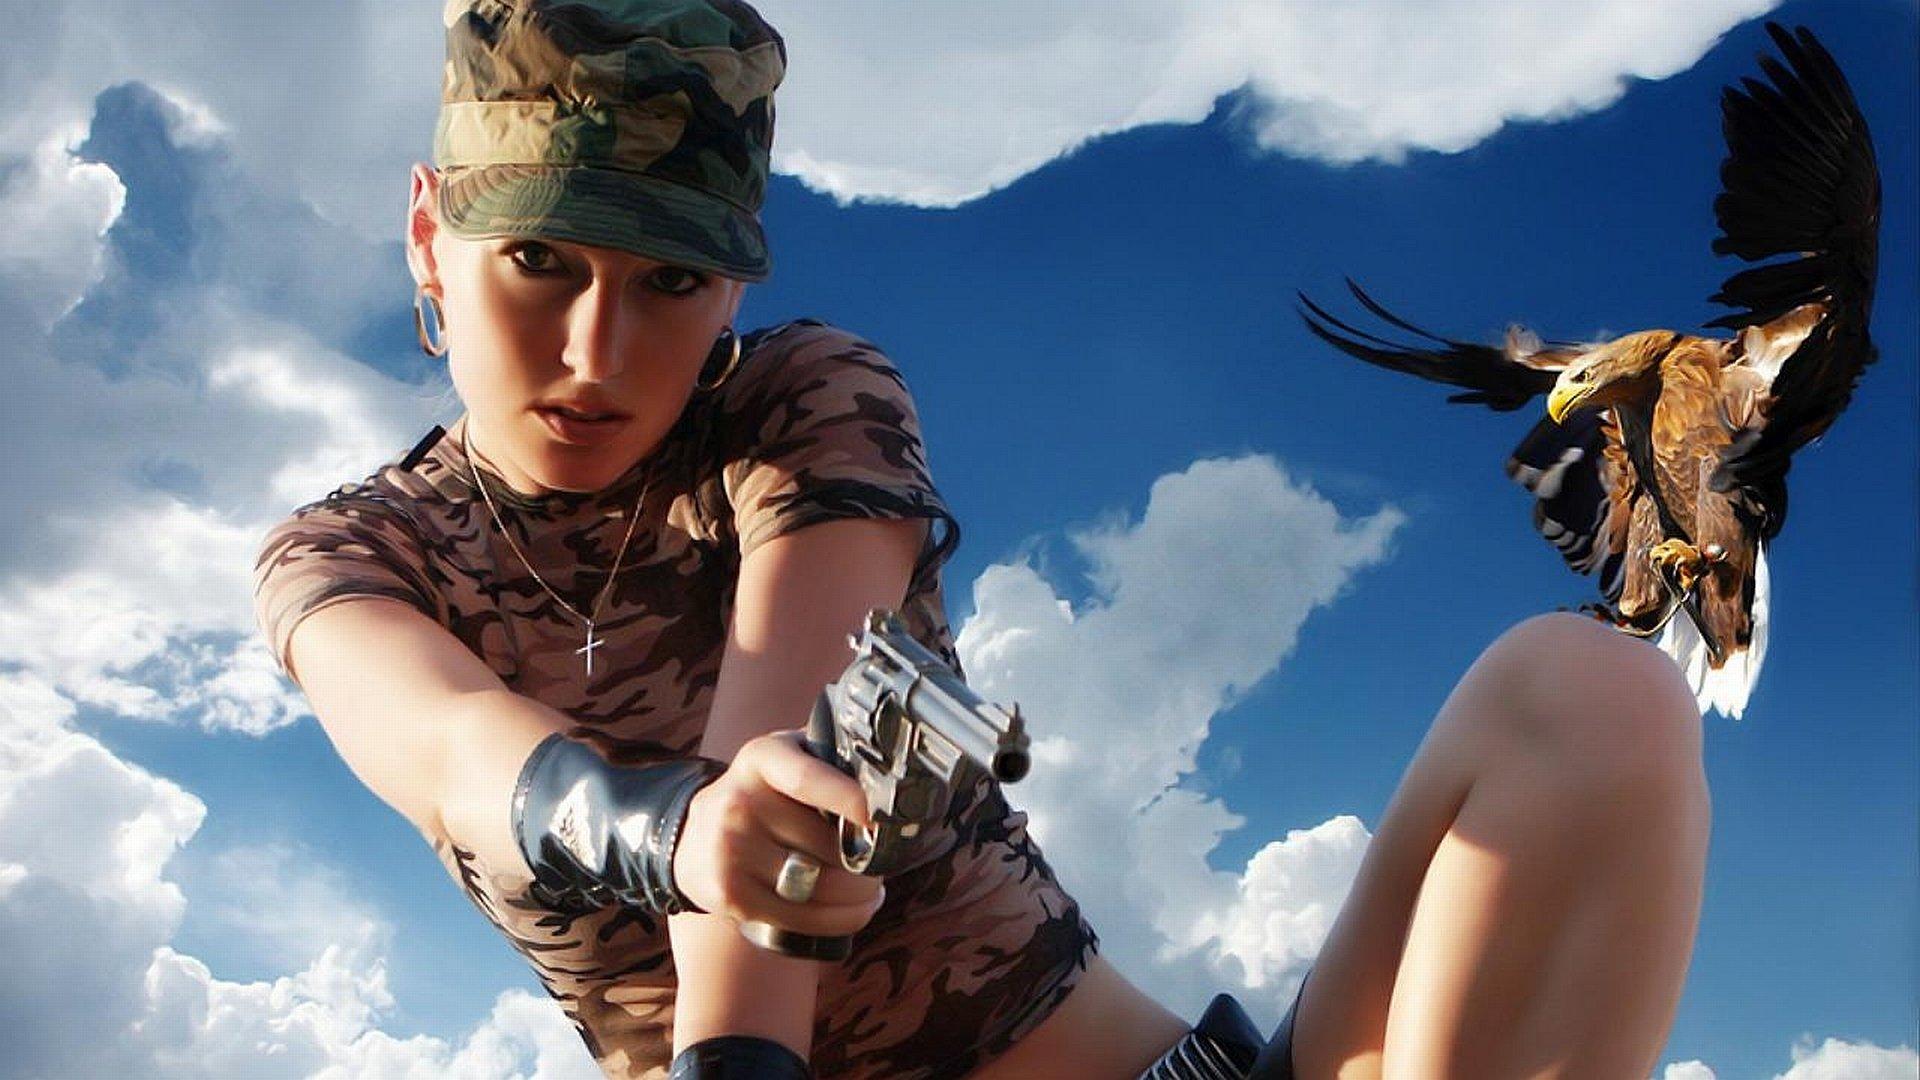 Girls  Guns Full Hd Wallpaper And Background Image -6050